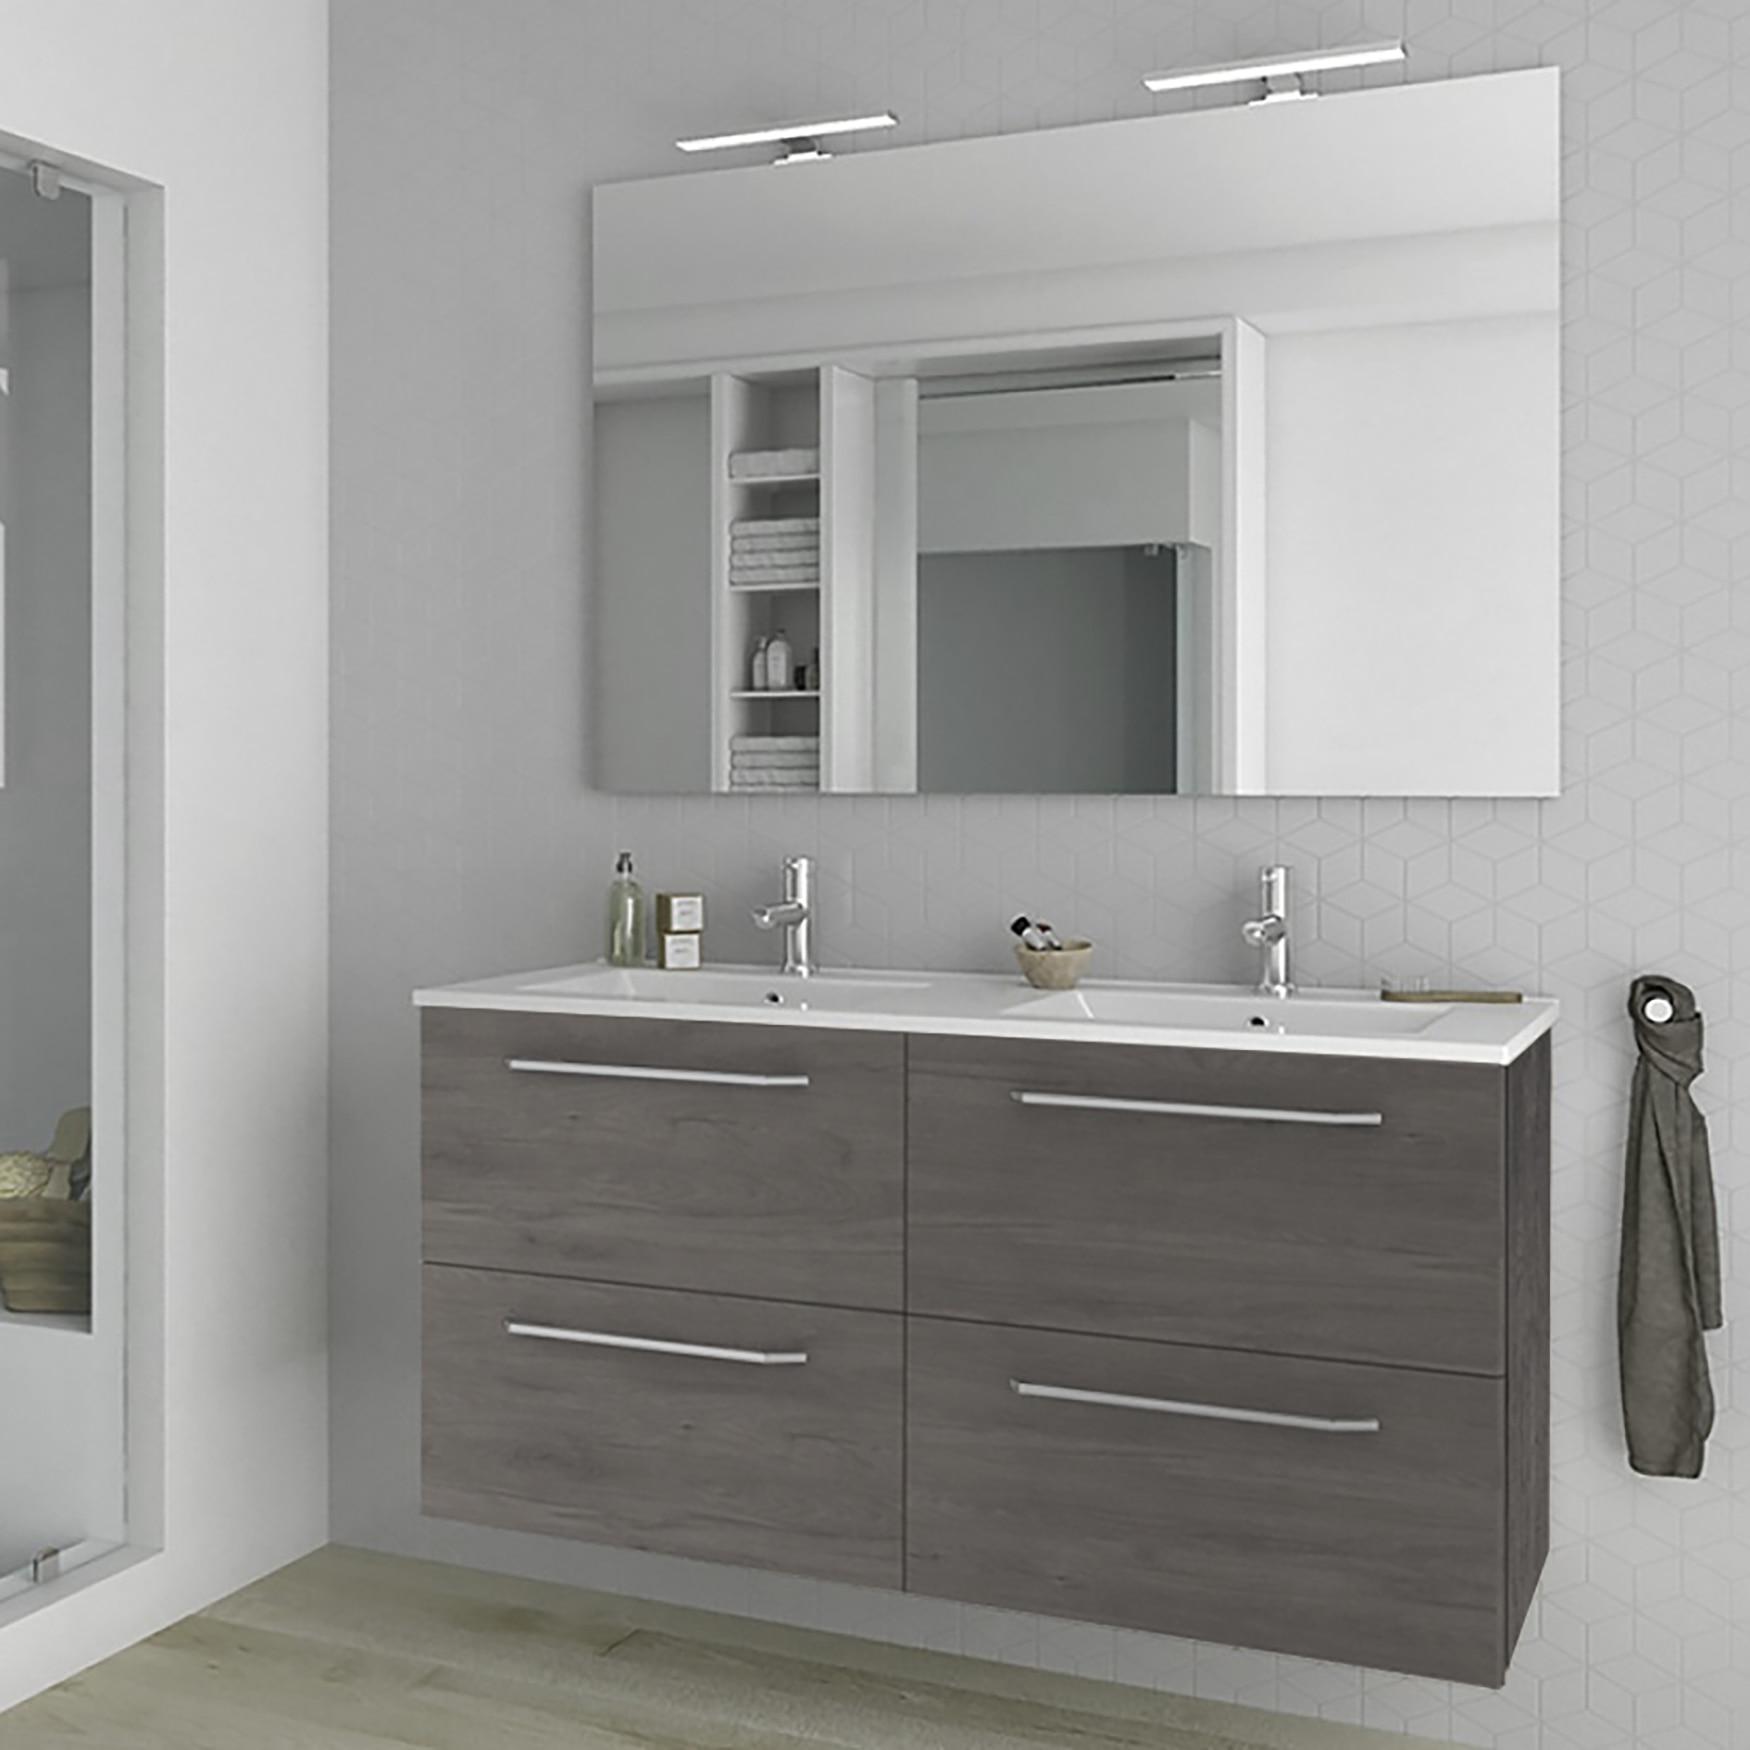 Modern Double Bathroom Vanity Cabinet